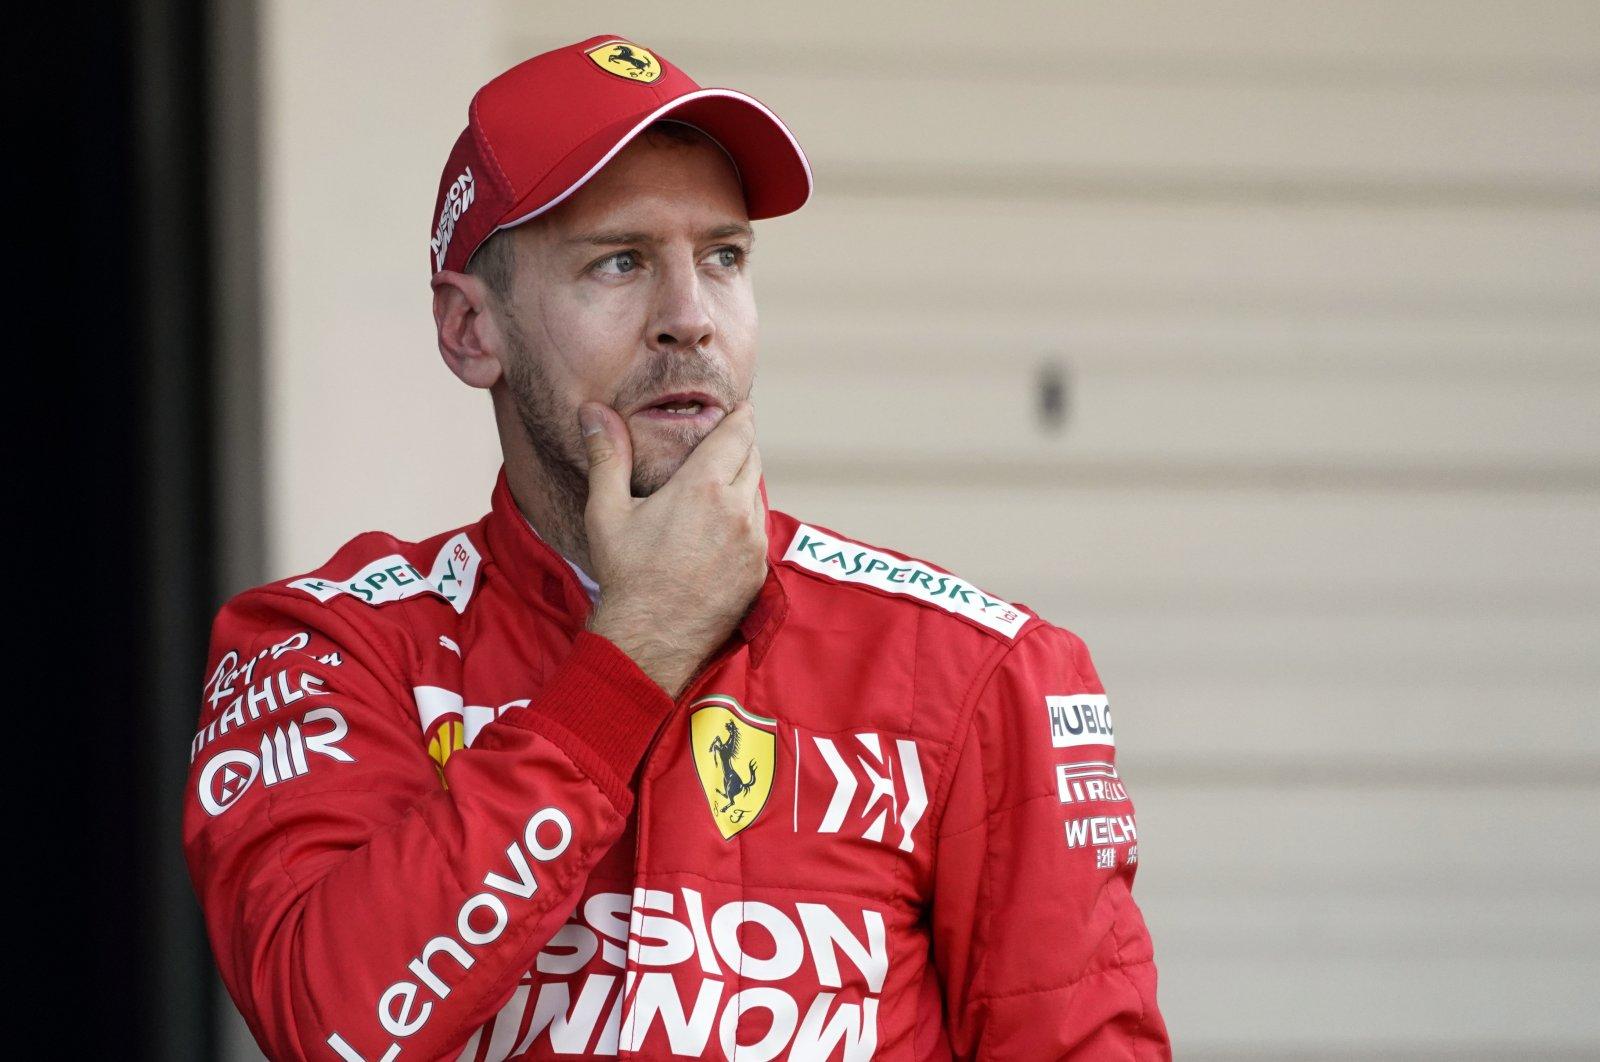 Sebastian Vettel reacts after a race in Suzuka, Japan, Oct. 13, 2019. (EPA Photo)